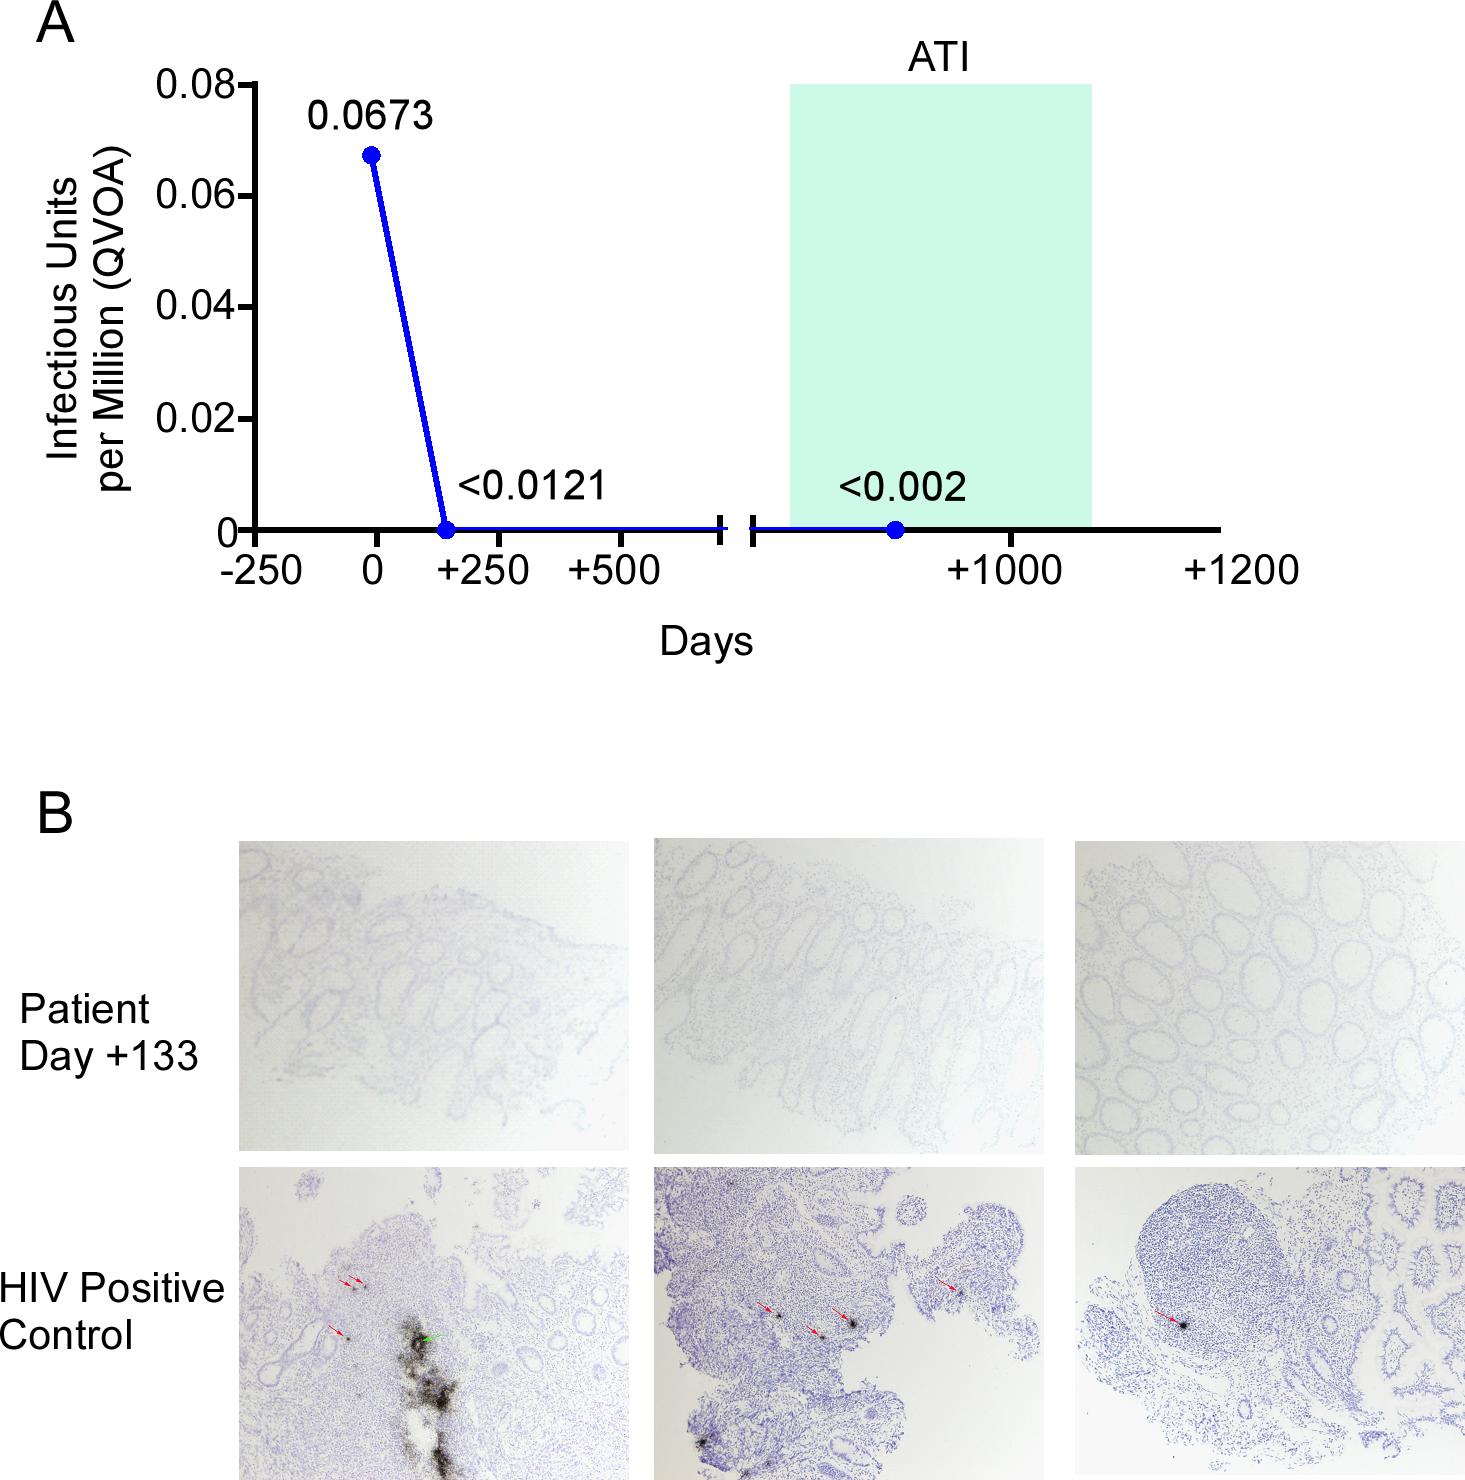 HIV-1 reservoir measurement in the peri-transplant period.